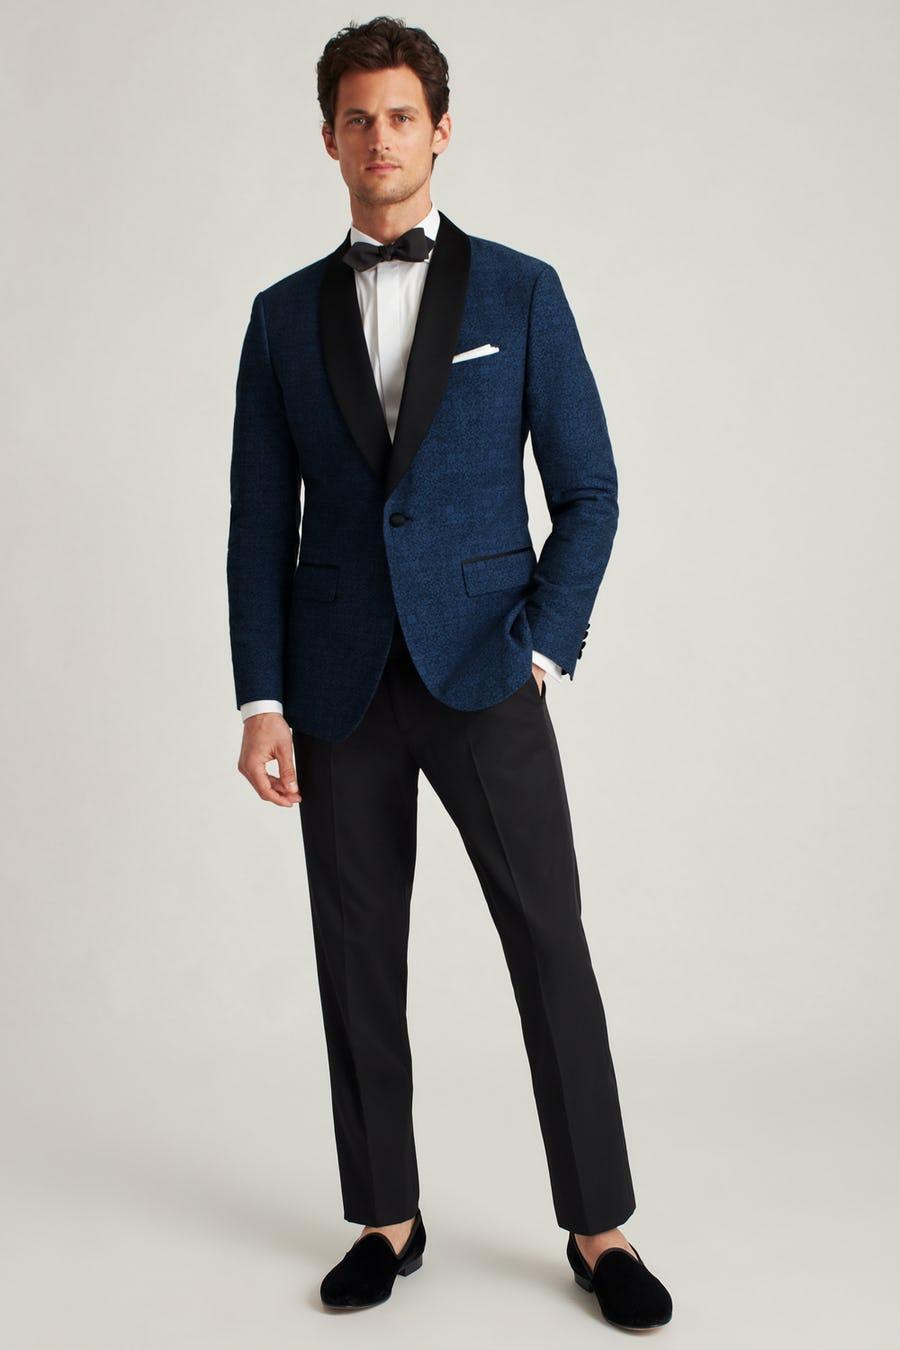 italian tuxedo jacket